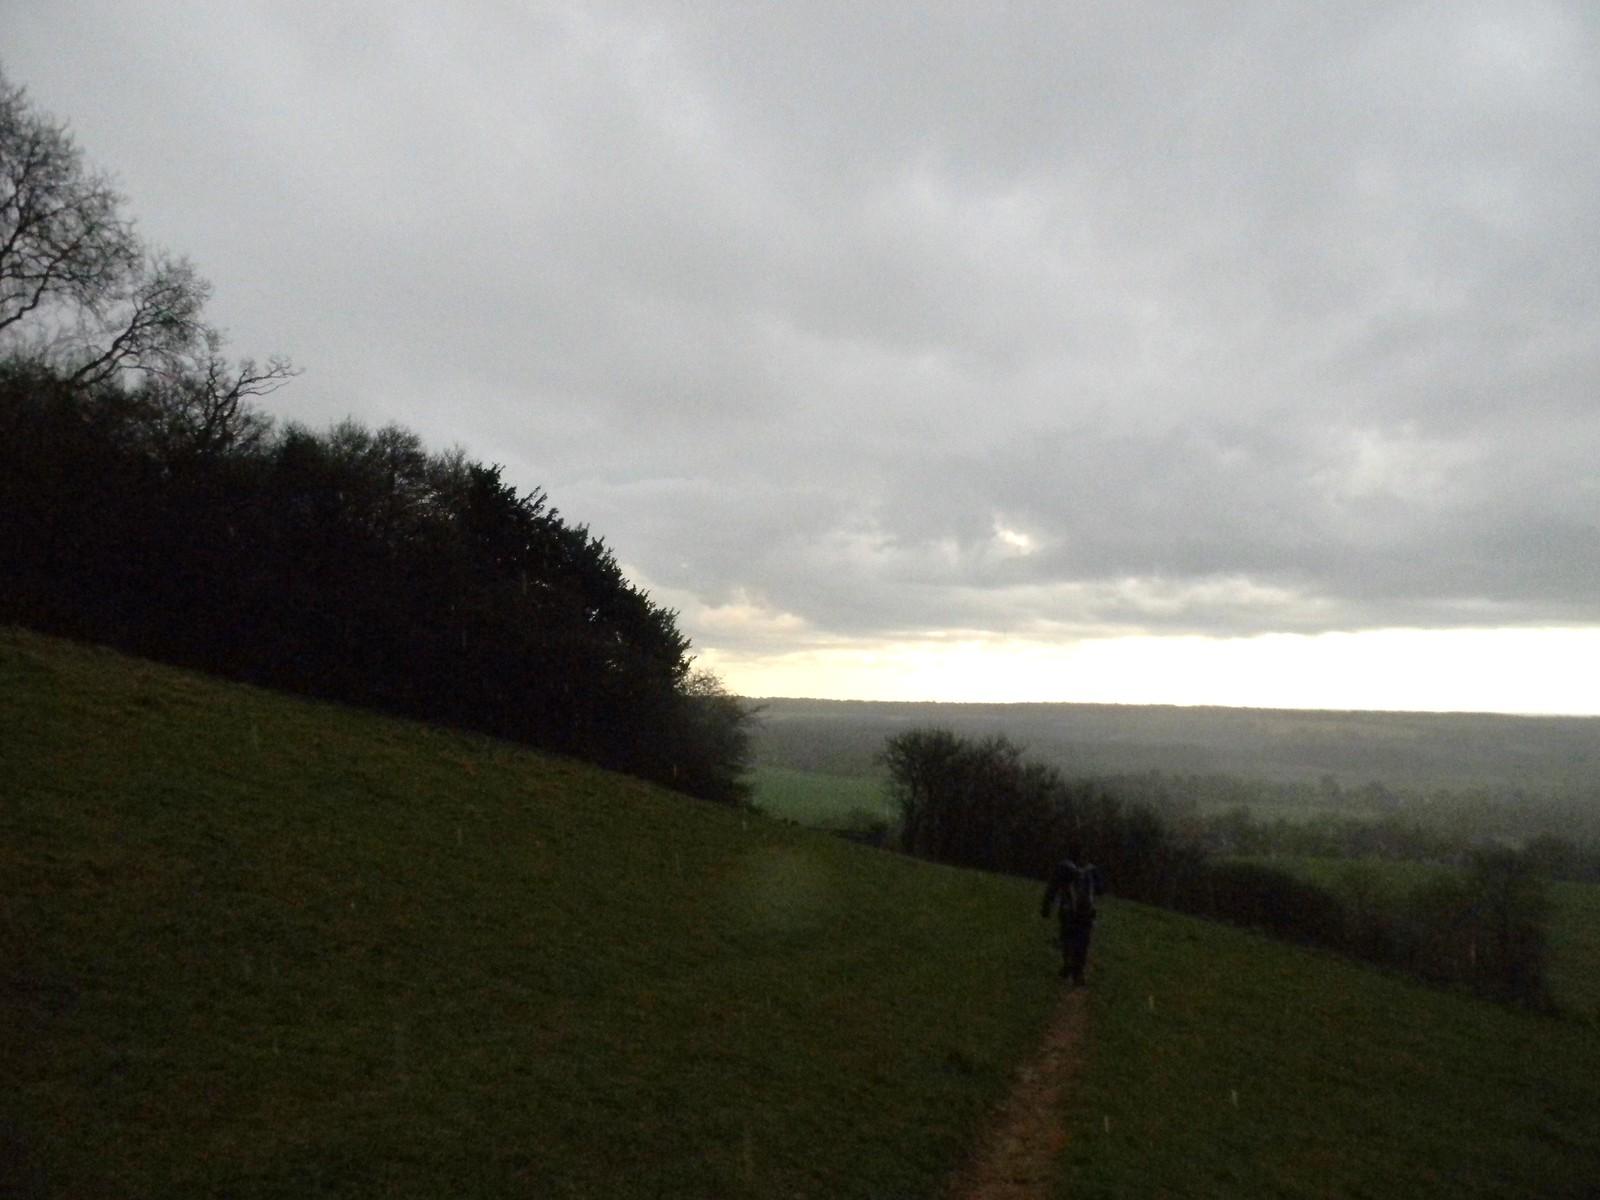 Rejoining the NDW Lenham to Hollingbourne